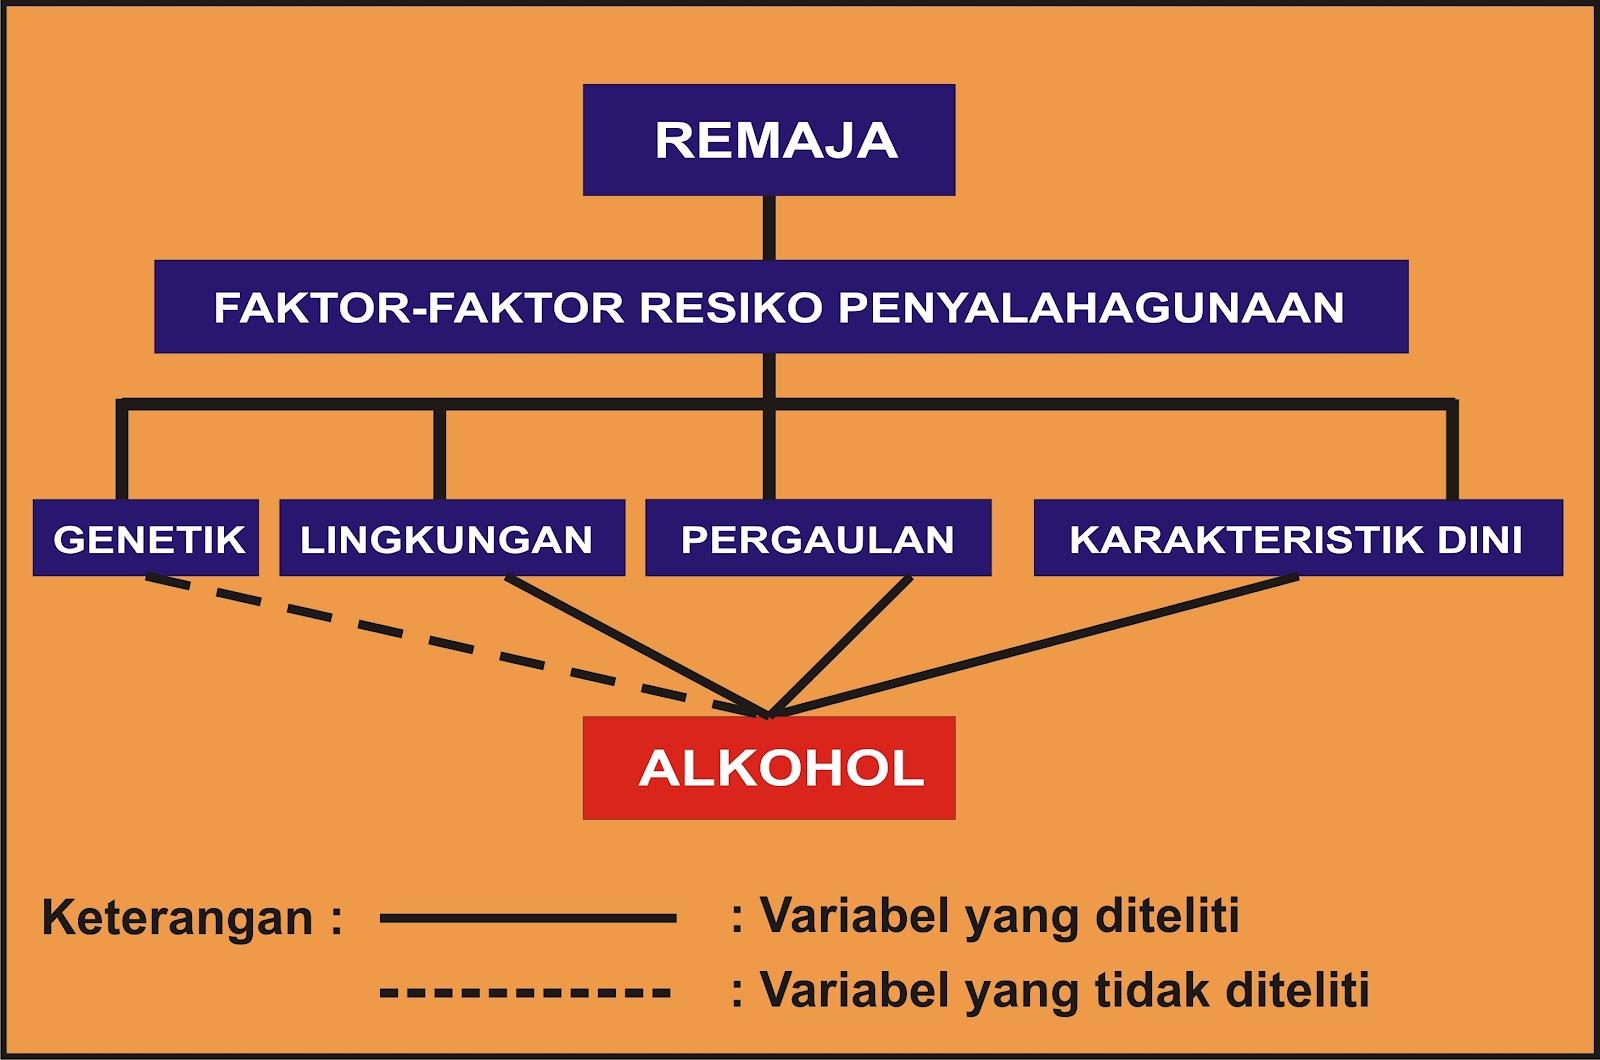 Contoh Proposal Penelitian Kelurahan Tesis Kenotariatan Kode Tp 44 I Contoh Proposal Tesis 21 Contoh Proposal Penelitian ; Faktor Faktor